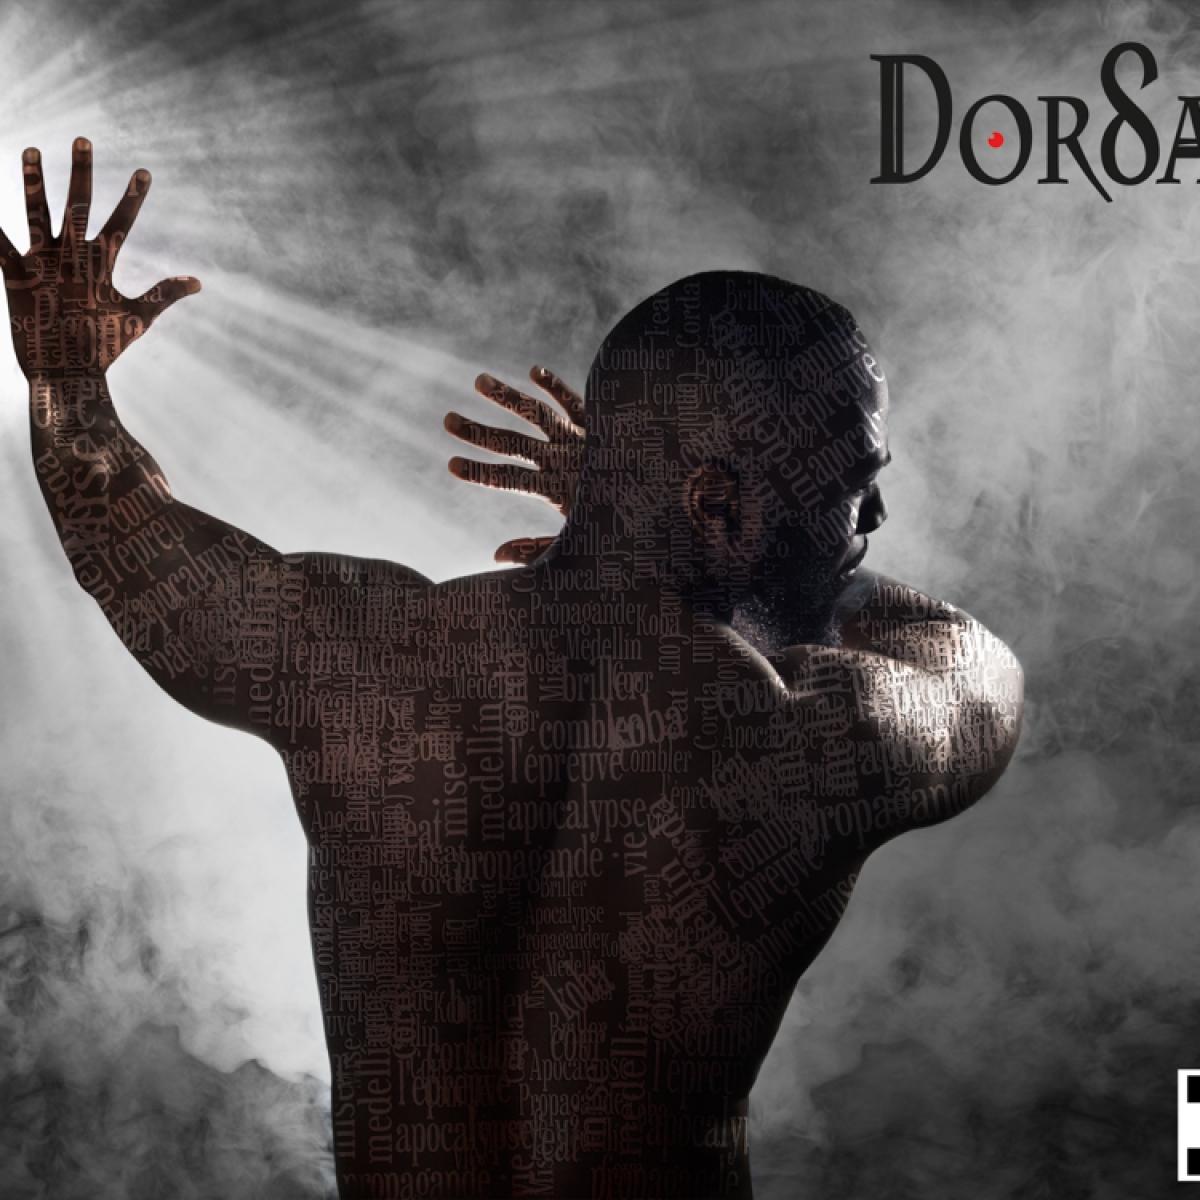 DORSAUX album de l'ombre a la lumiere © MARWAN MOUSSA , mariocoiffe, studio